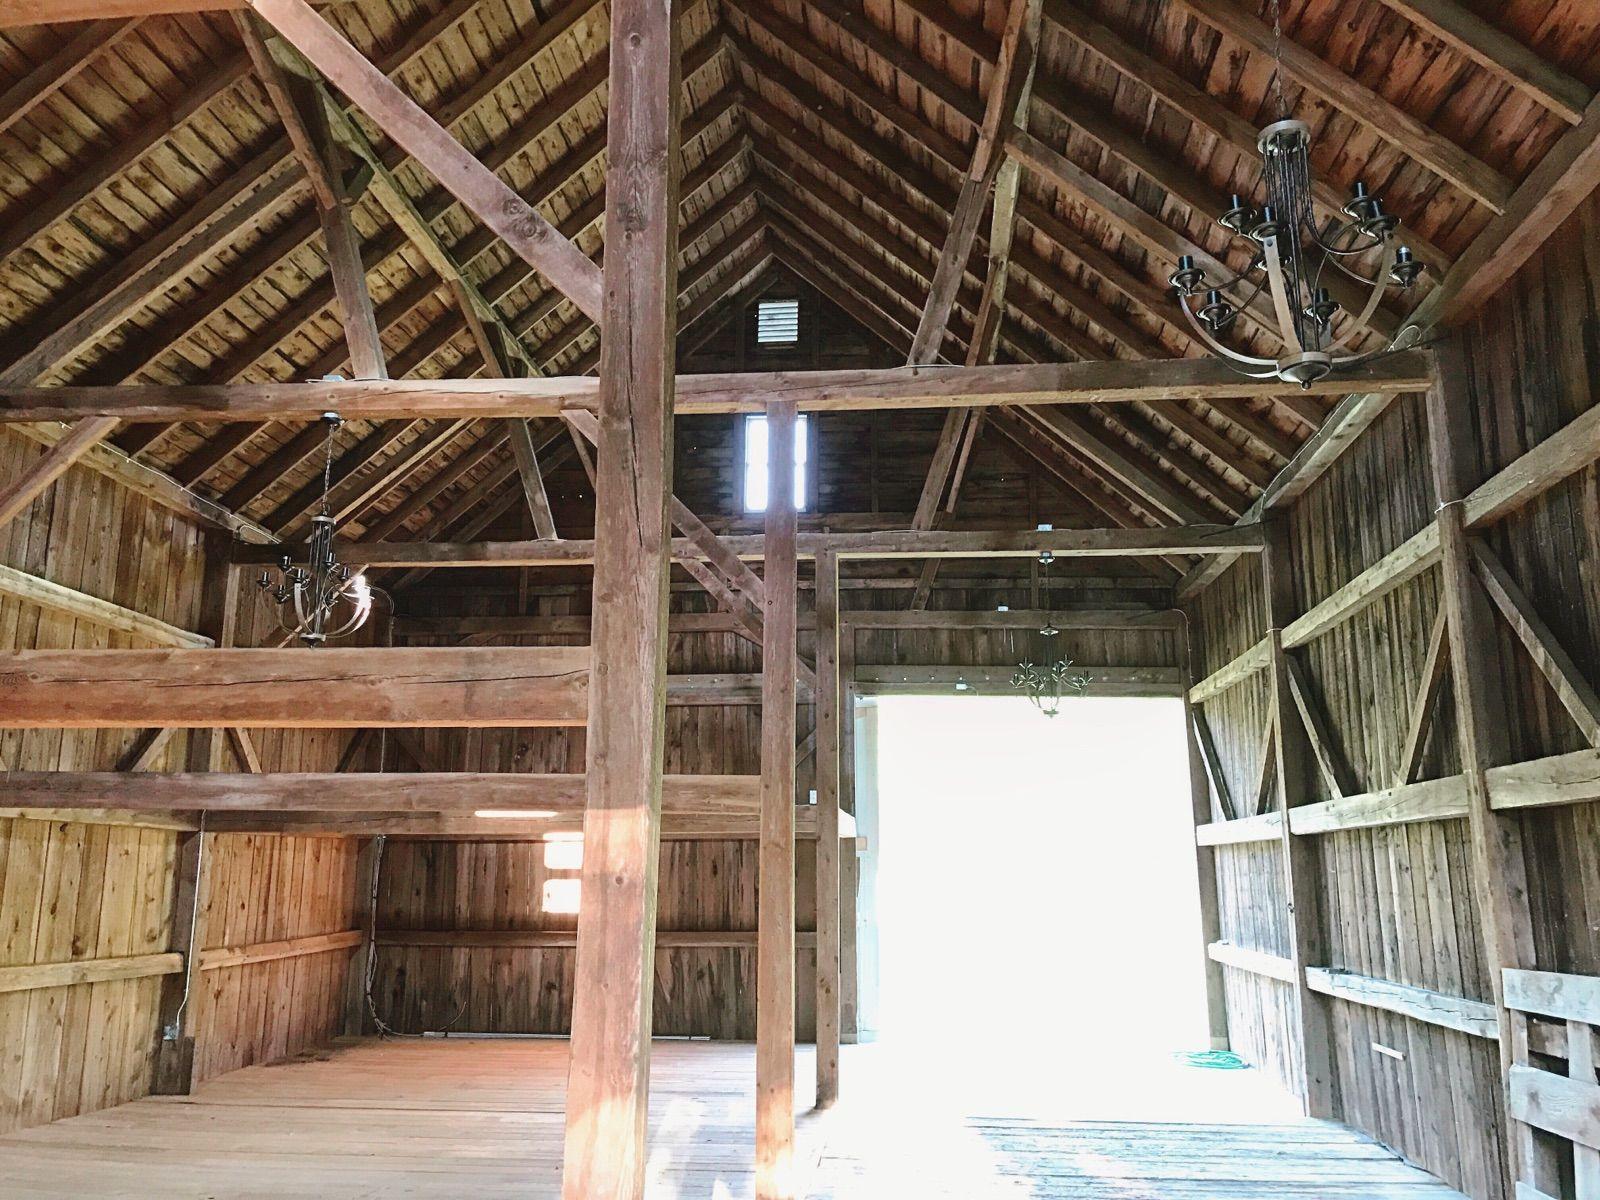 Hay Barn Interior At Cunningham Farm Barns Estate Venue In Maine Maine Wedding Venues Barn Wedding Venue Maine Wedding